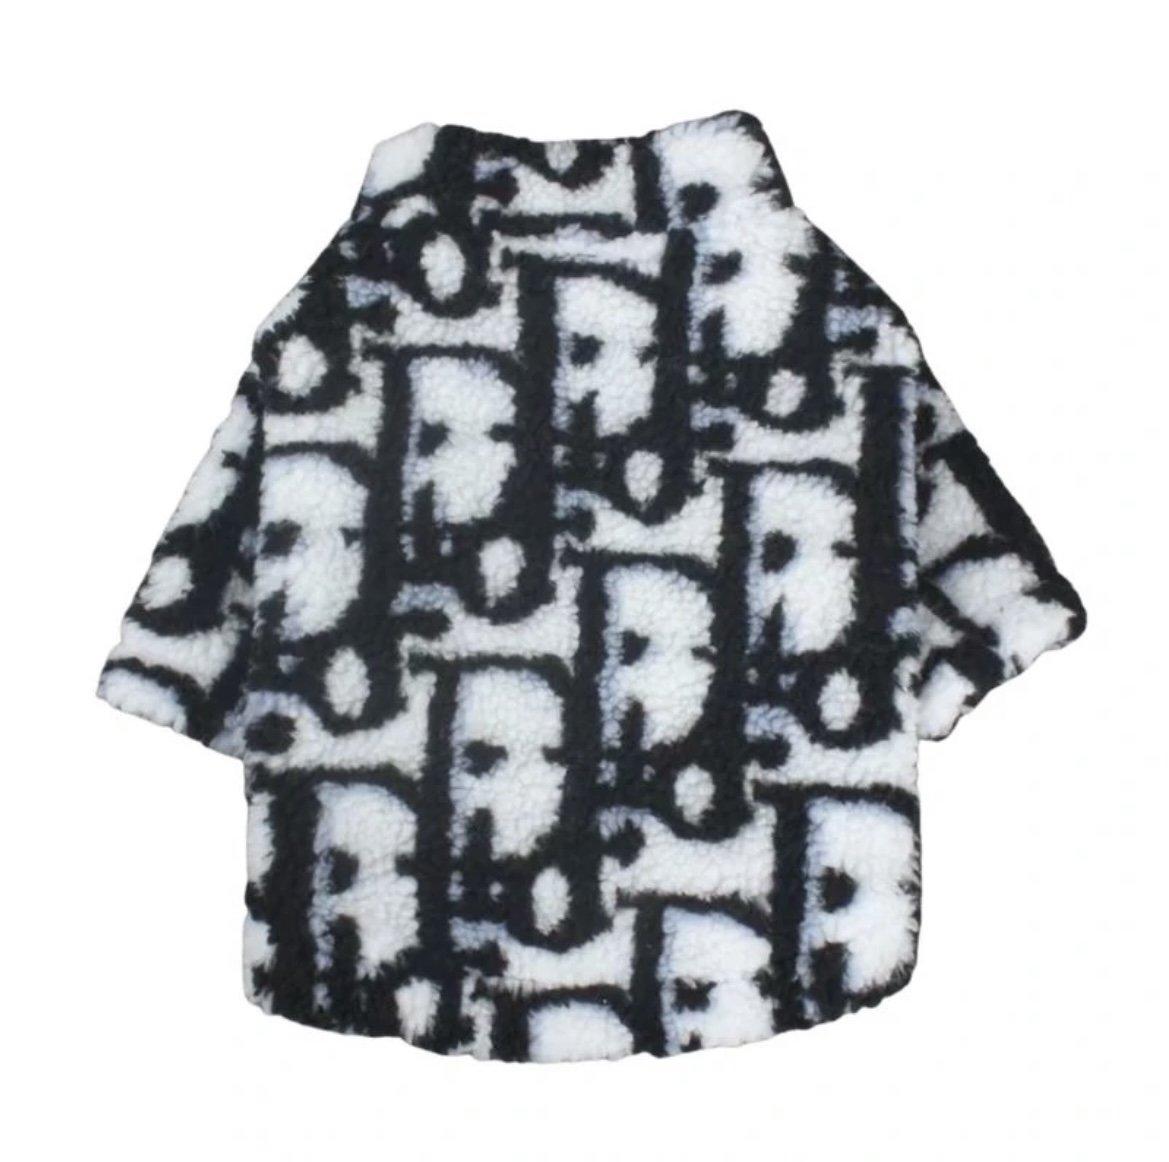 Dogior Faux Fur Dog Coat